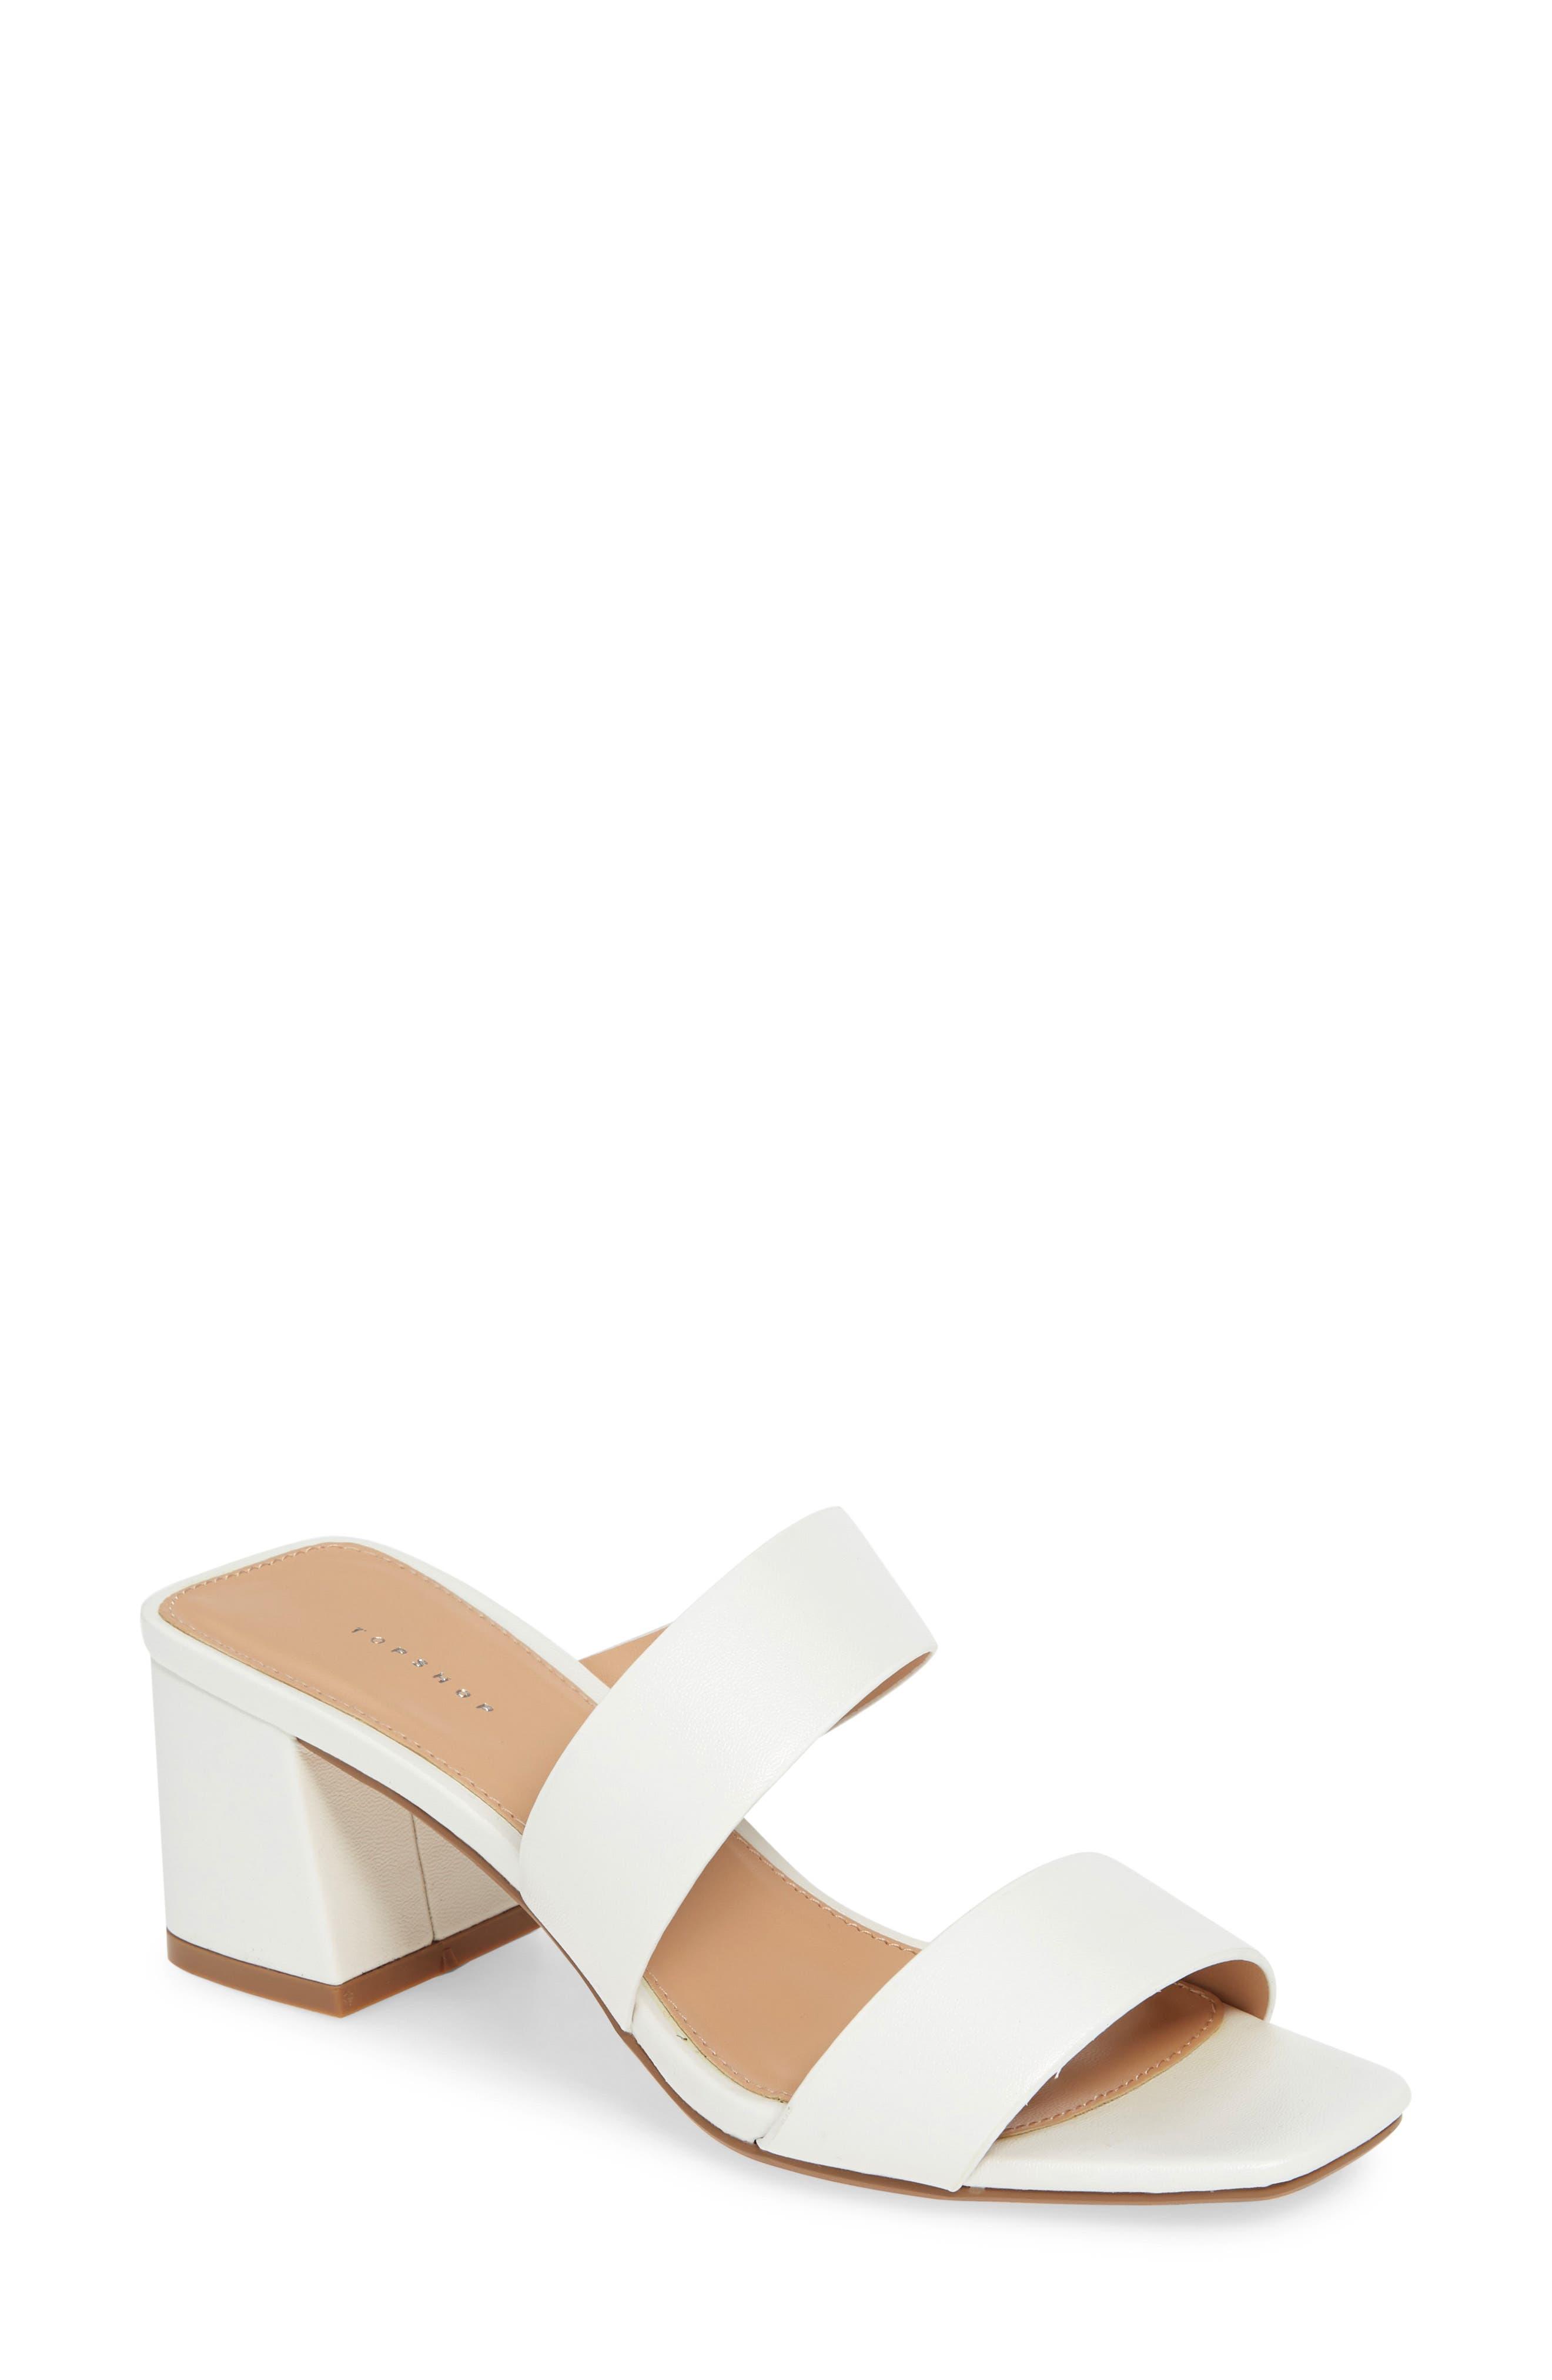 TOPSHOP Darla Slide Sandal, Main, color, WHITE